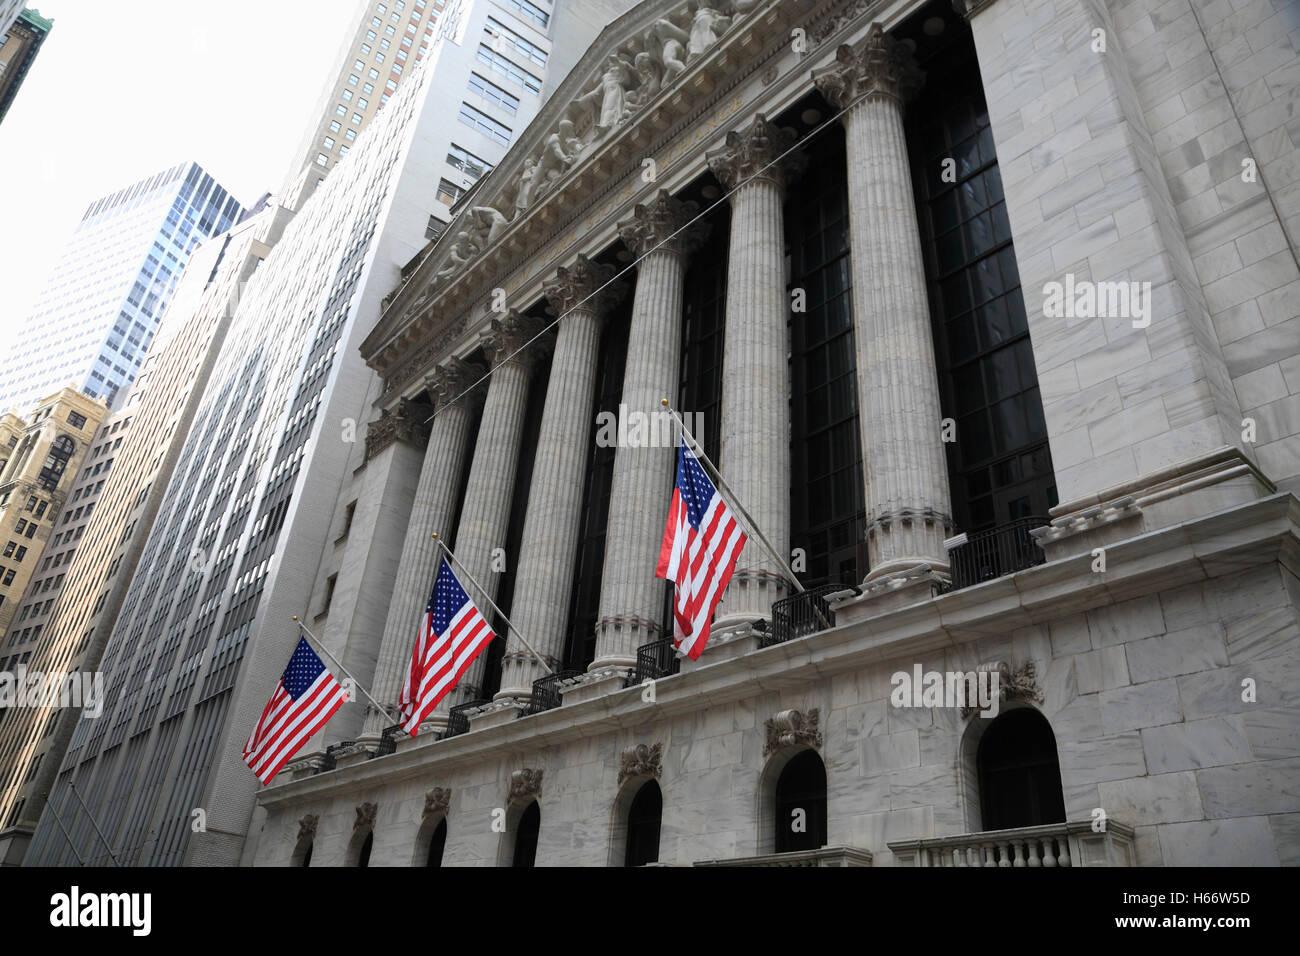 La Bourse de New York, Wall Street, Manhattan, New York, USA Photo Stock